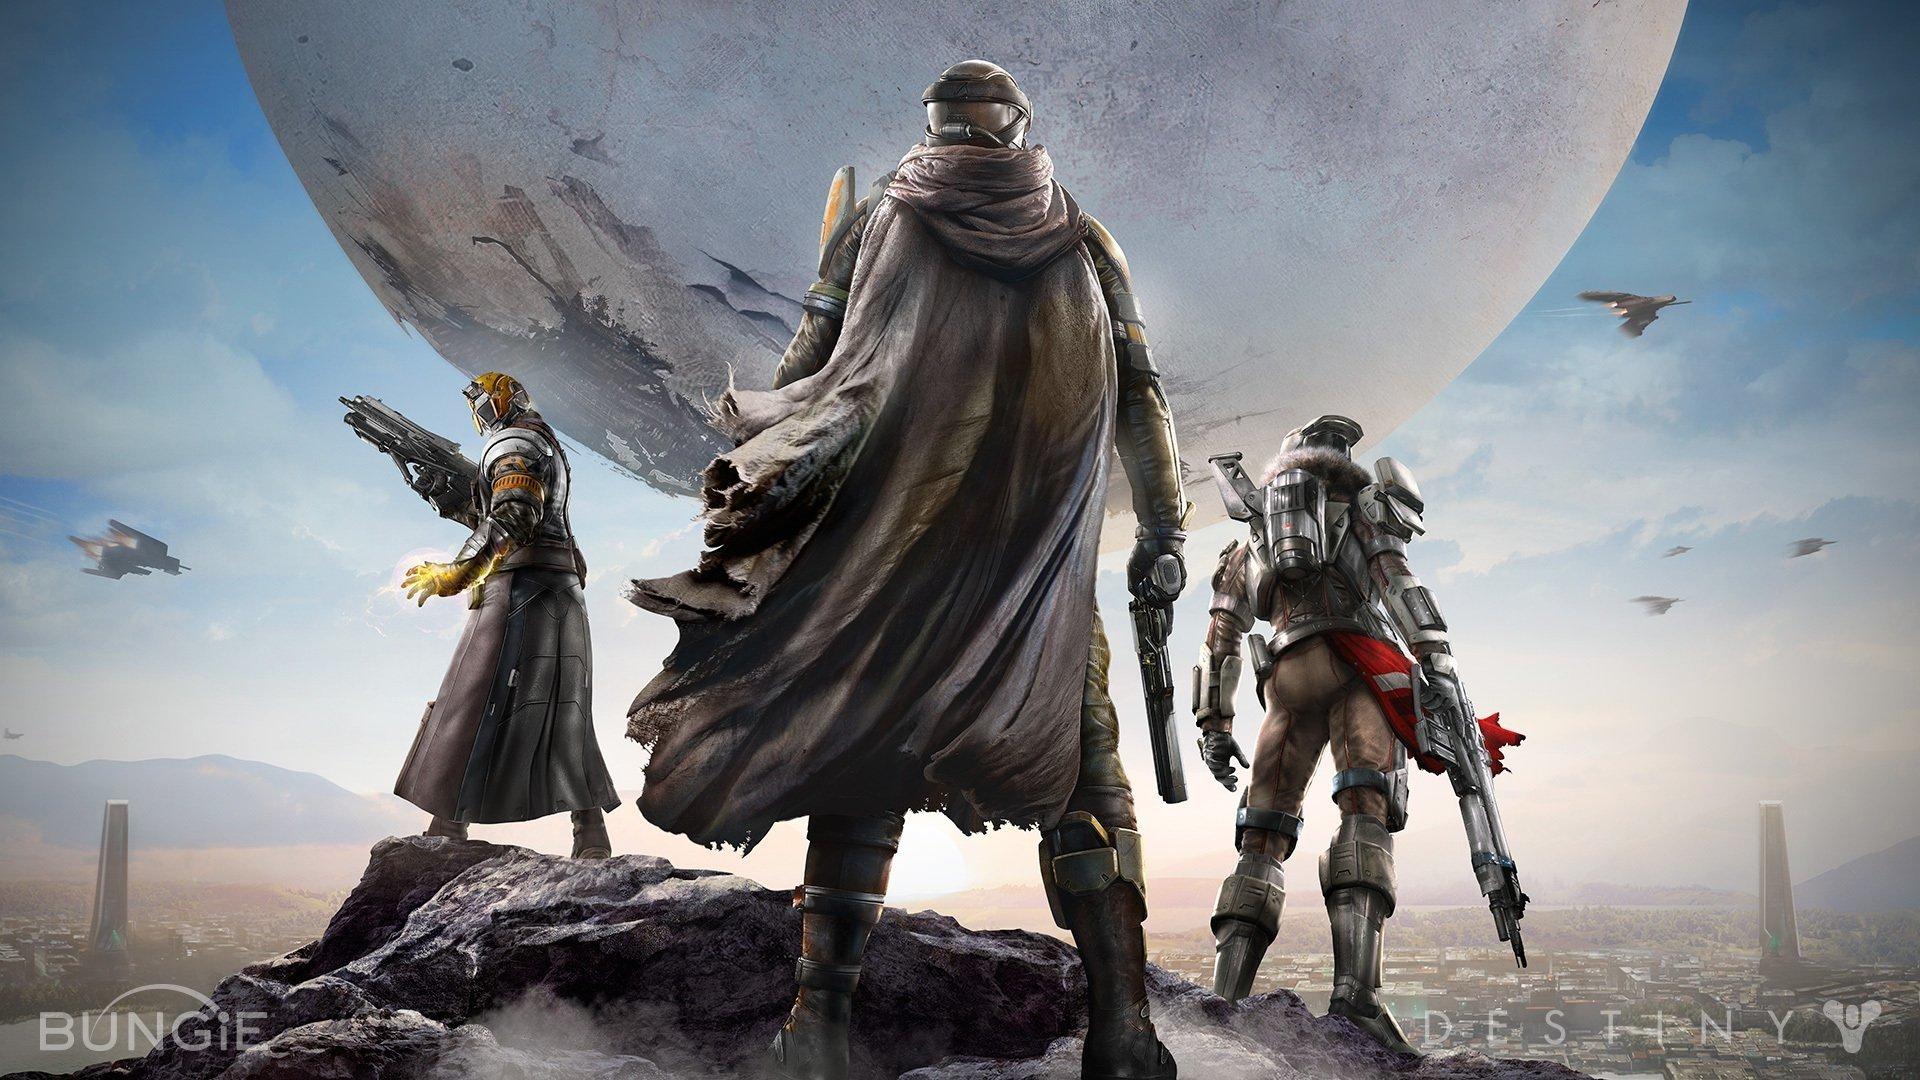 Destiny promotional artwork